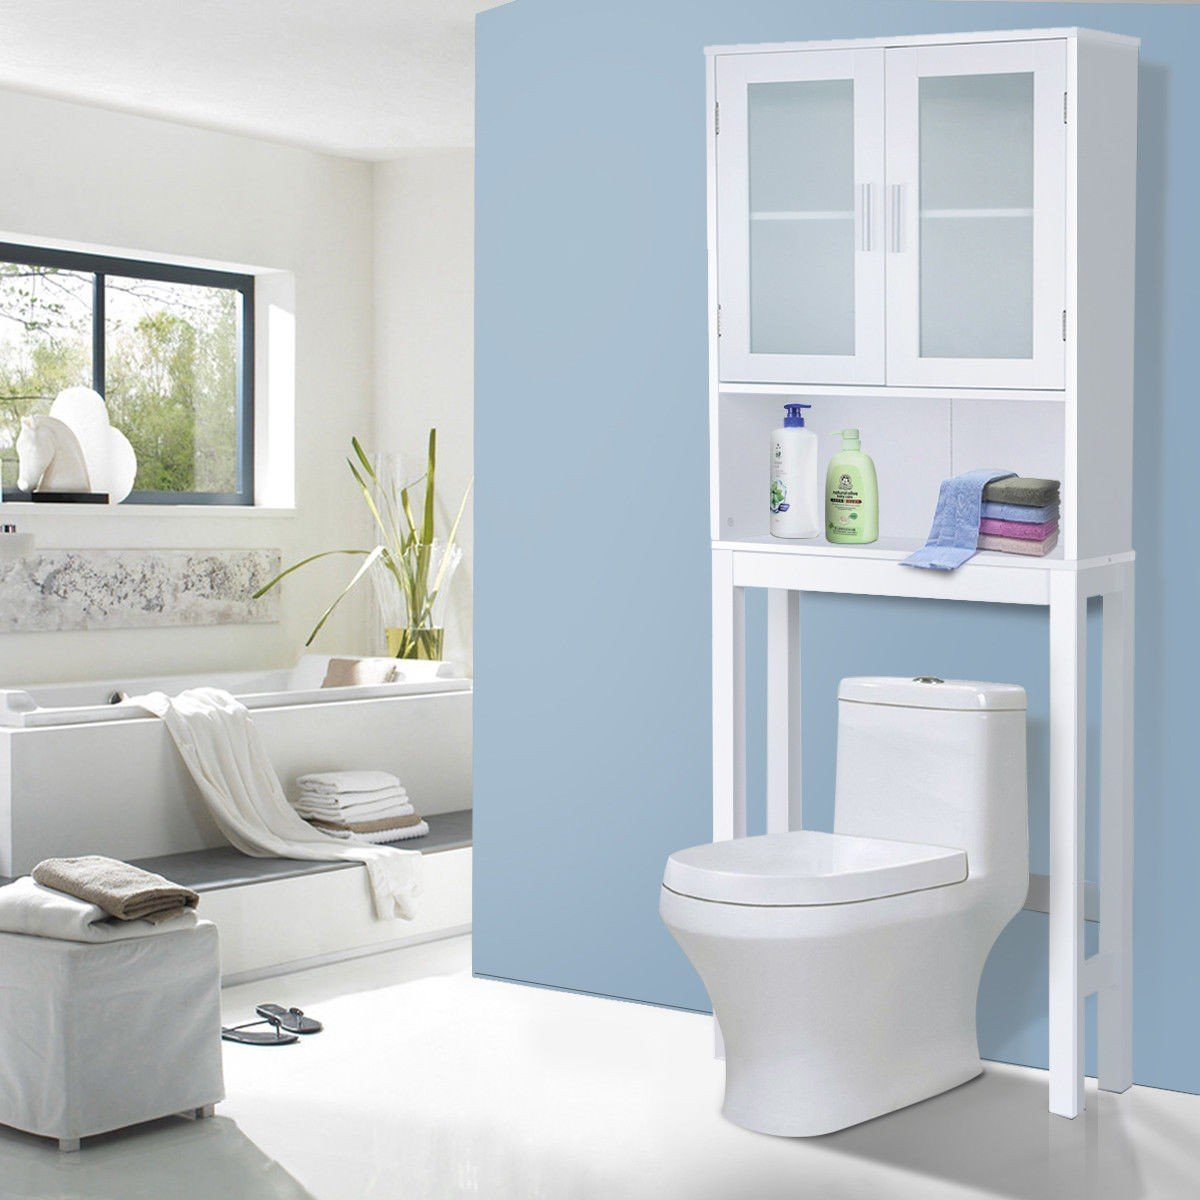 Wooden Storage Cabinet, Bathroom Over-The-Toilet Space Saver Double Door Linen Toiletry Storage Cabinet Tower (61.3) by GentleShower